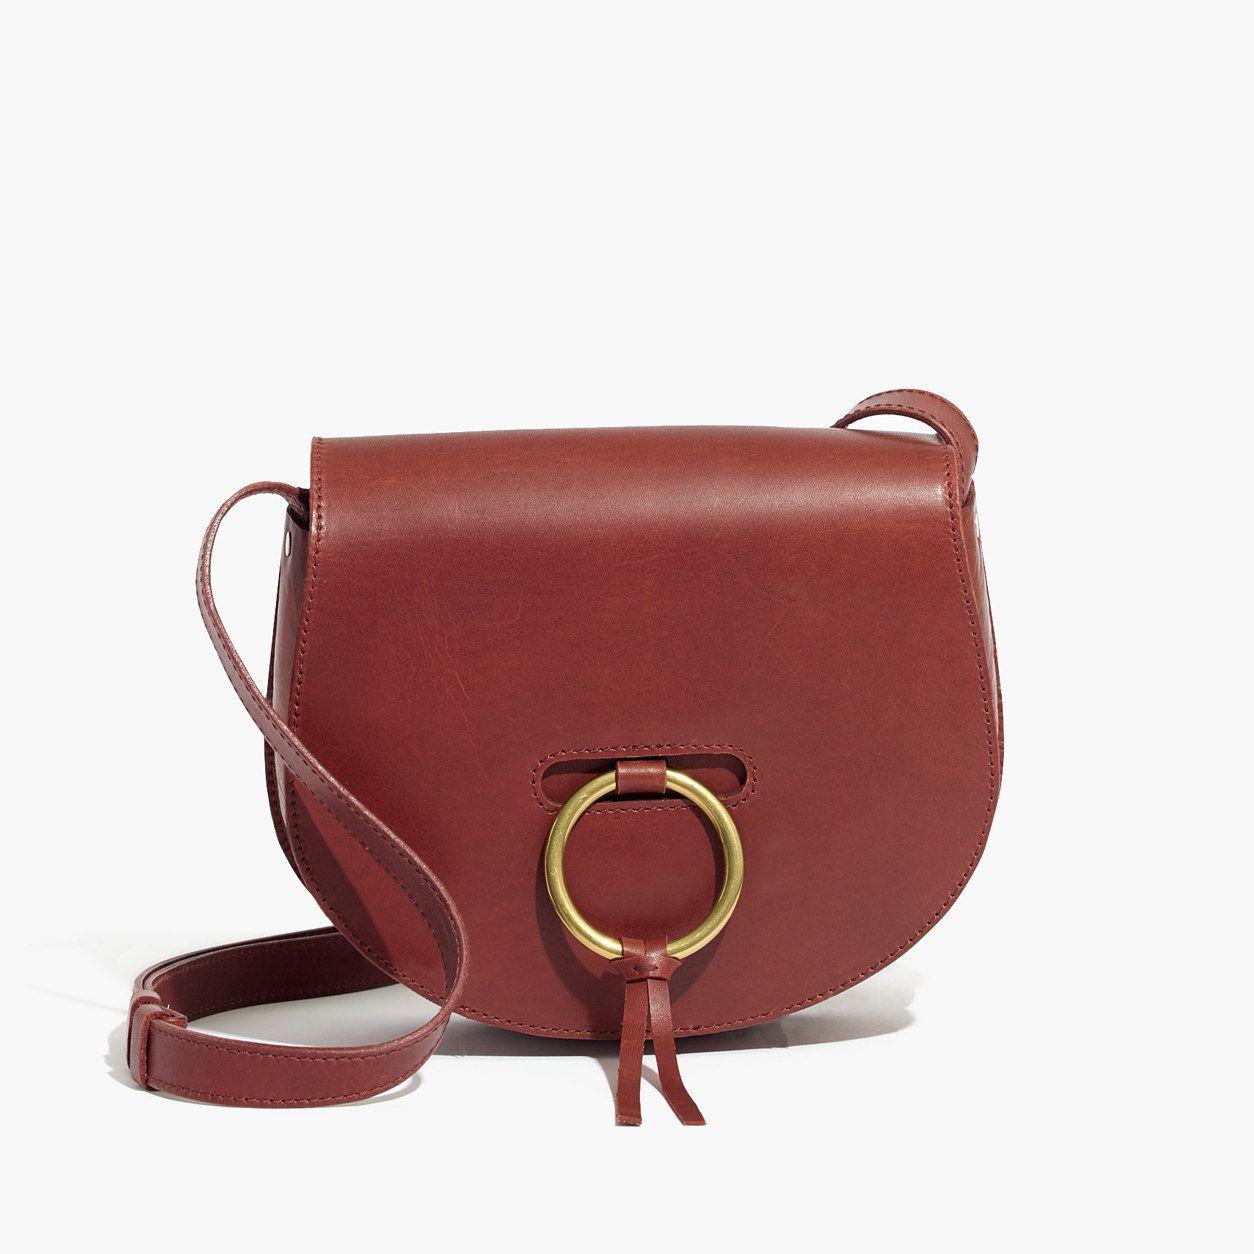 18e5ac84d957 Madewell The Lisbon O-Ring Saddlebag In Leather